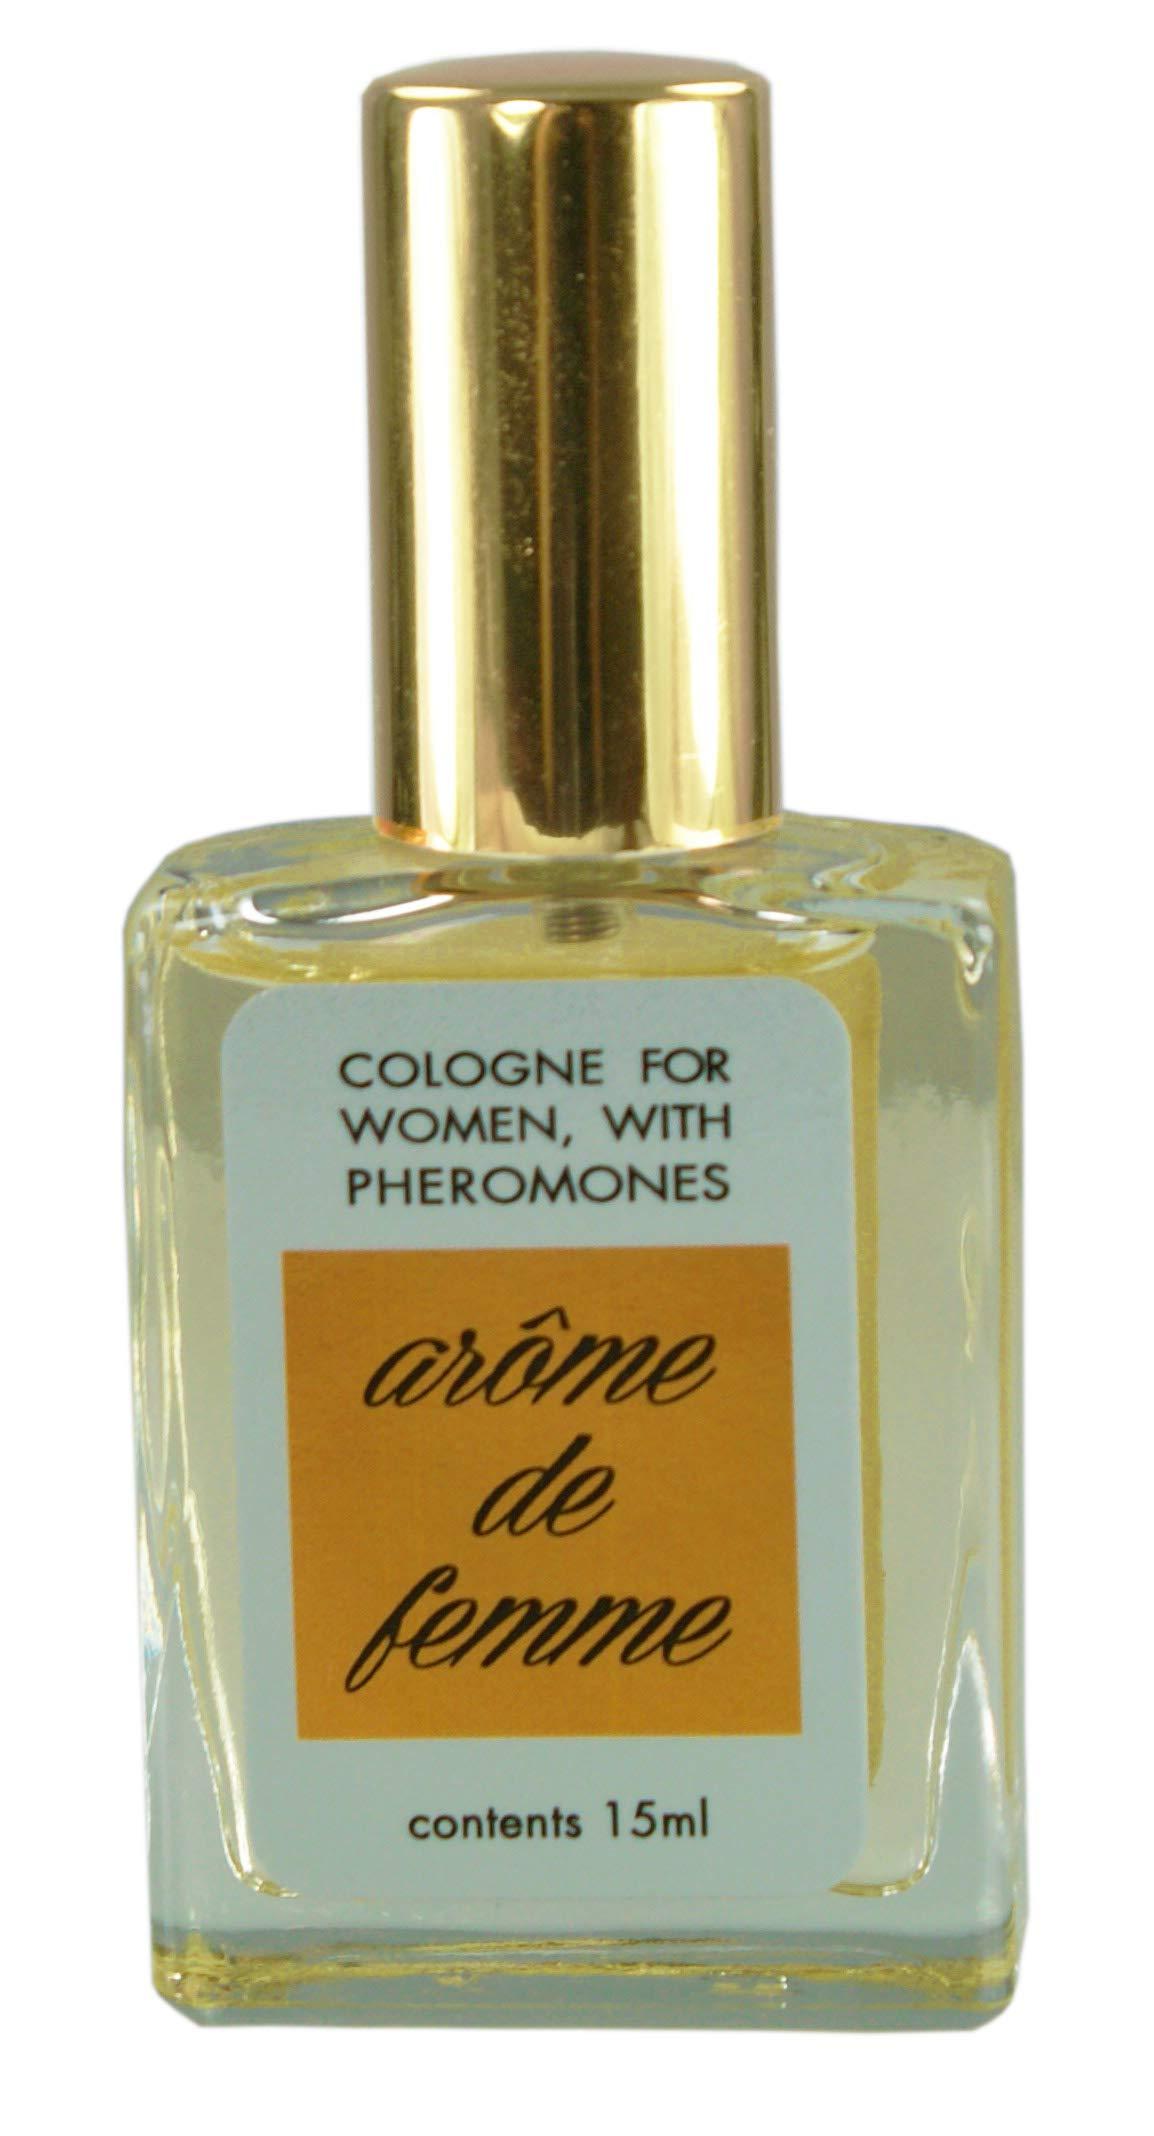 Arome De Femme - 15 ML - Copulin Pheromone Perfume For Women To Attract Men